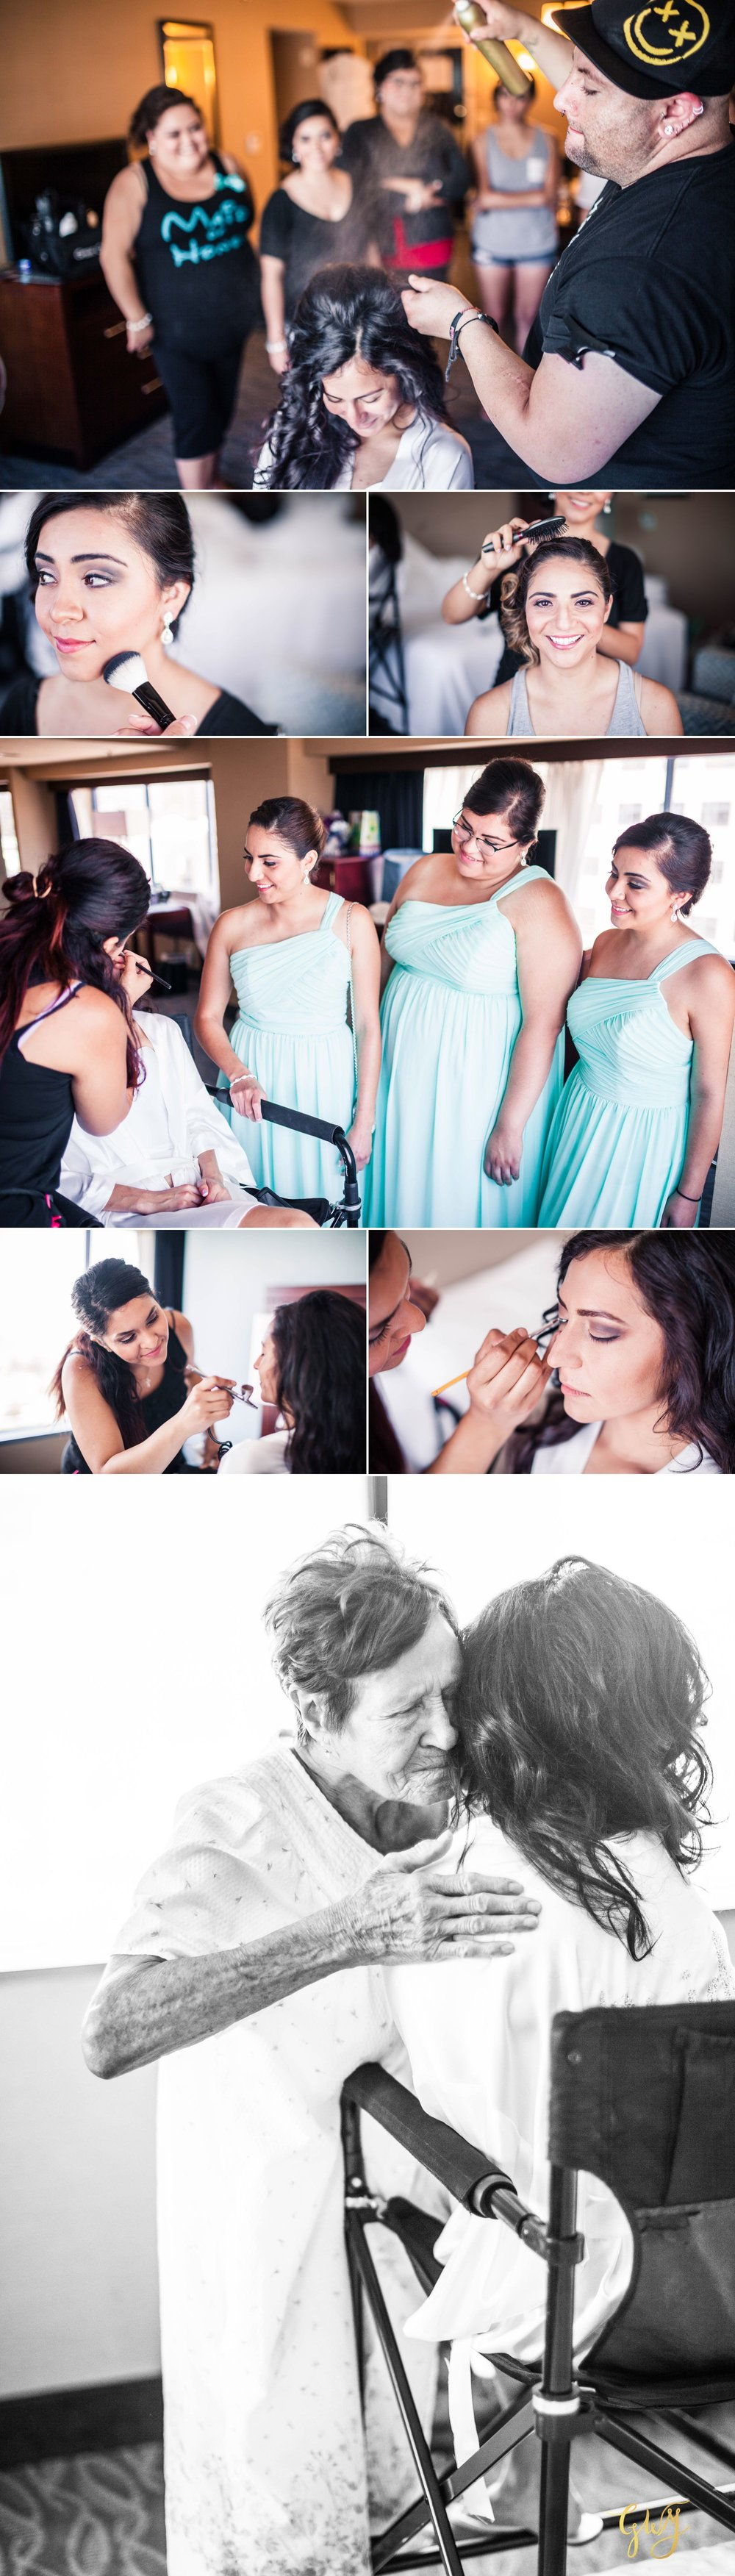 Krista + Roberto Neighborhood Church Rancho Palos Verdes Wedding by Glass Woods Media 3.jpg